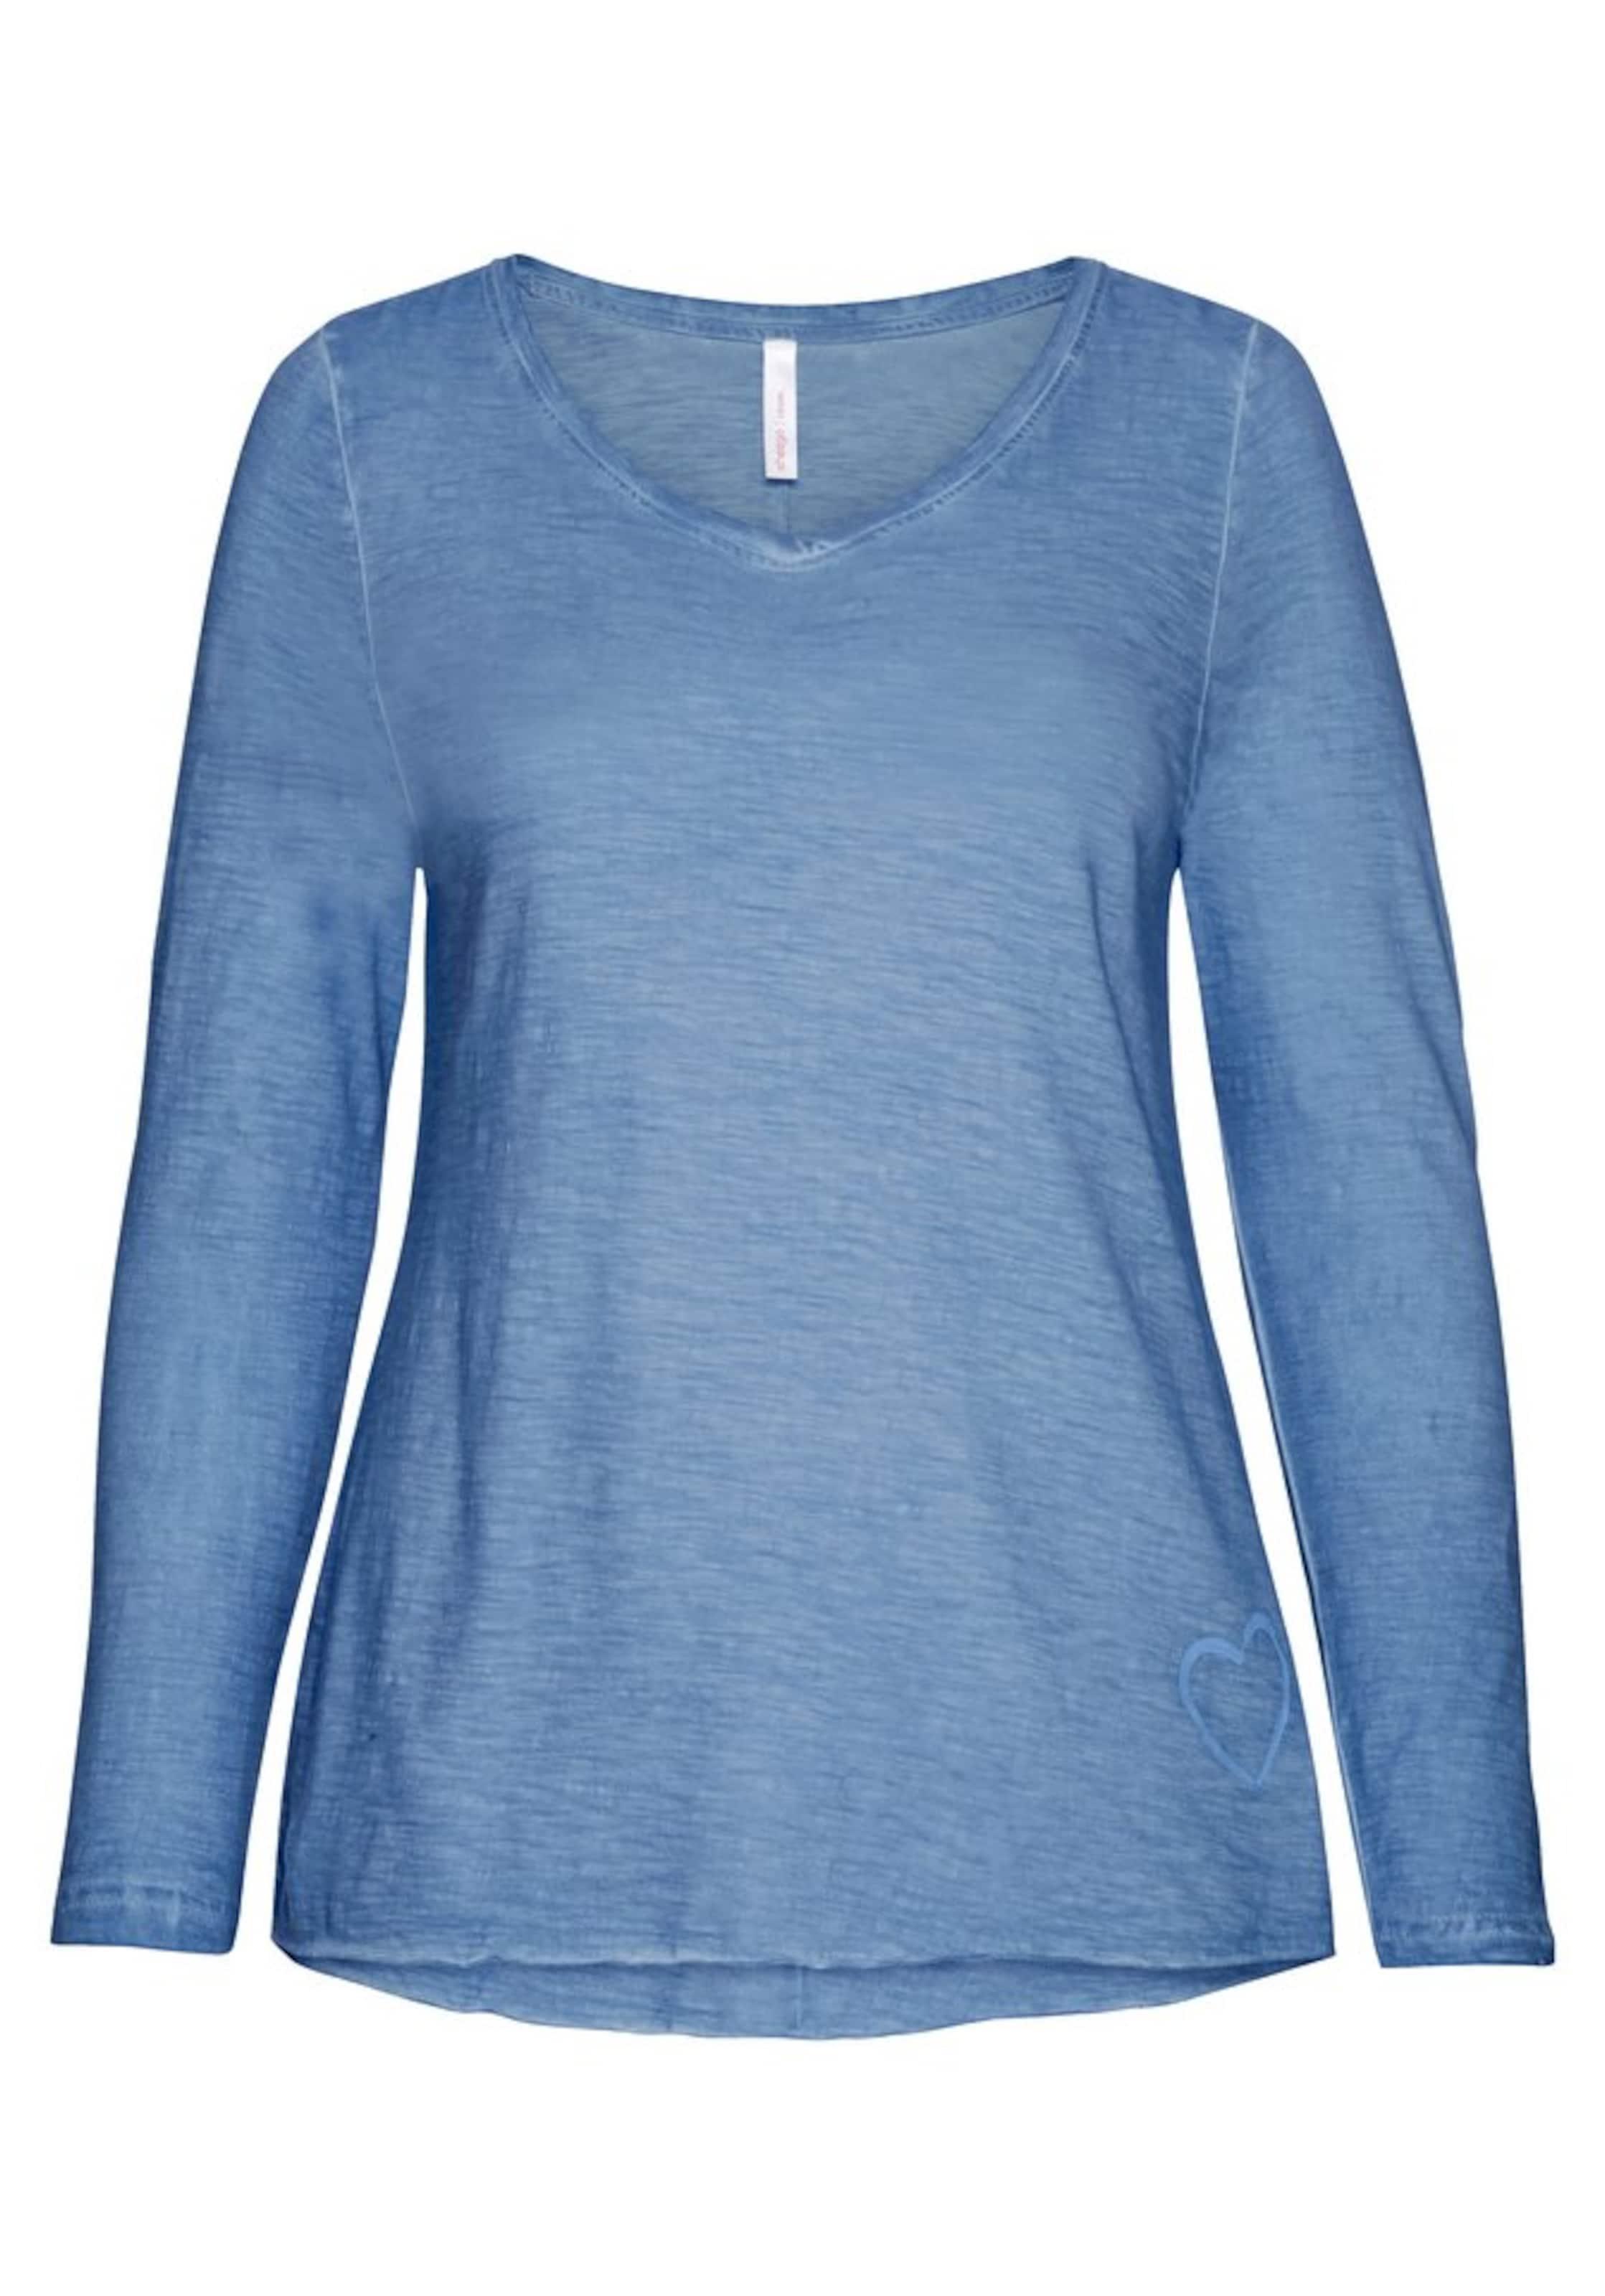 Casual Casual In Casual In Sheego Royalblau Shirt Royalblau Sheego Shirt Sheego IHD9WE2